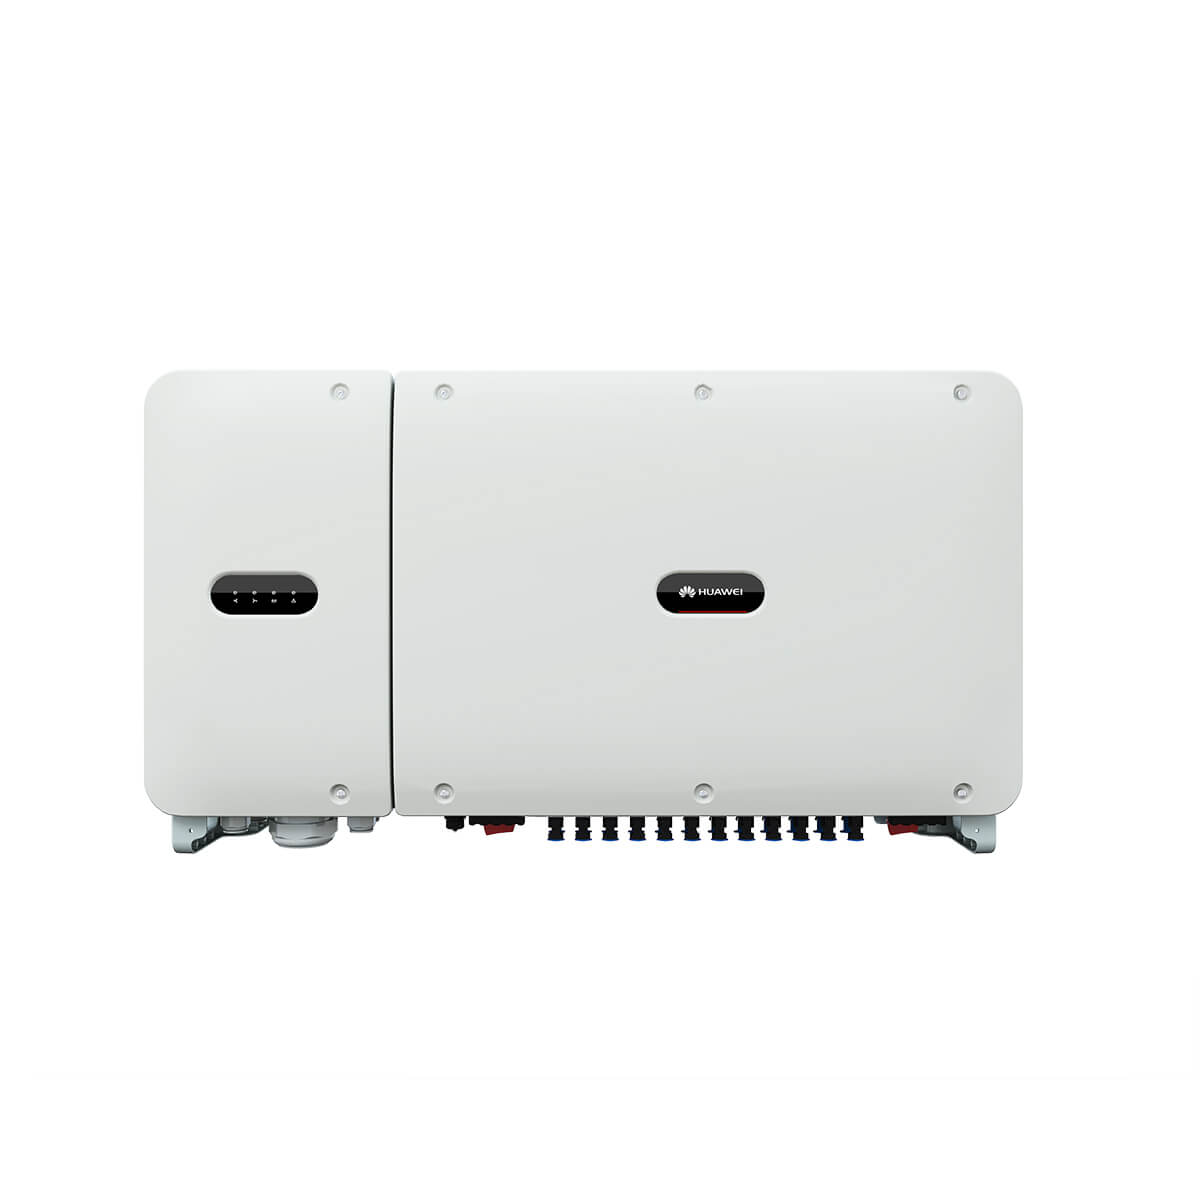 huawei 105kW inverter, huawei sun2000 105kW inverter, huawei sun2000-105ktl-h1 inverter, huawei sun2000-105ktl-h1, huawei sun2000 105 kW, HUAWEI 105 KW